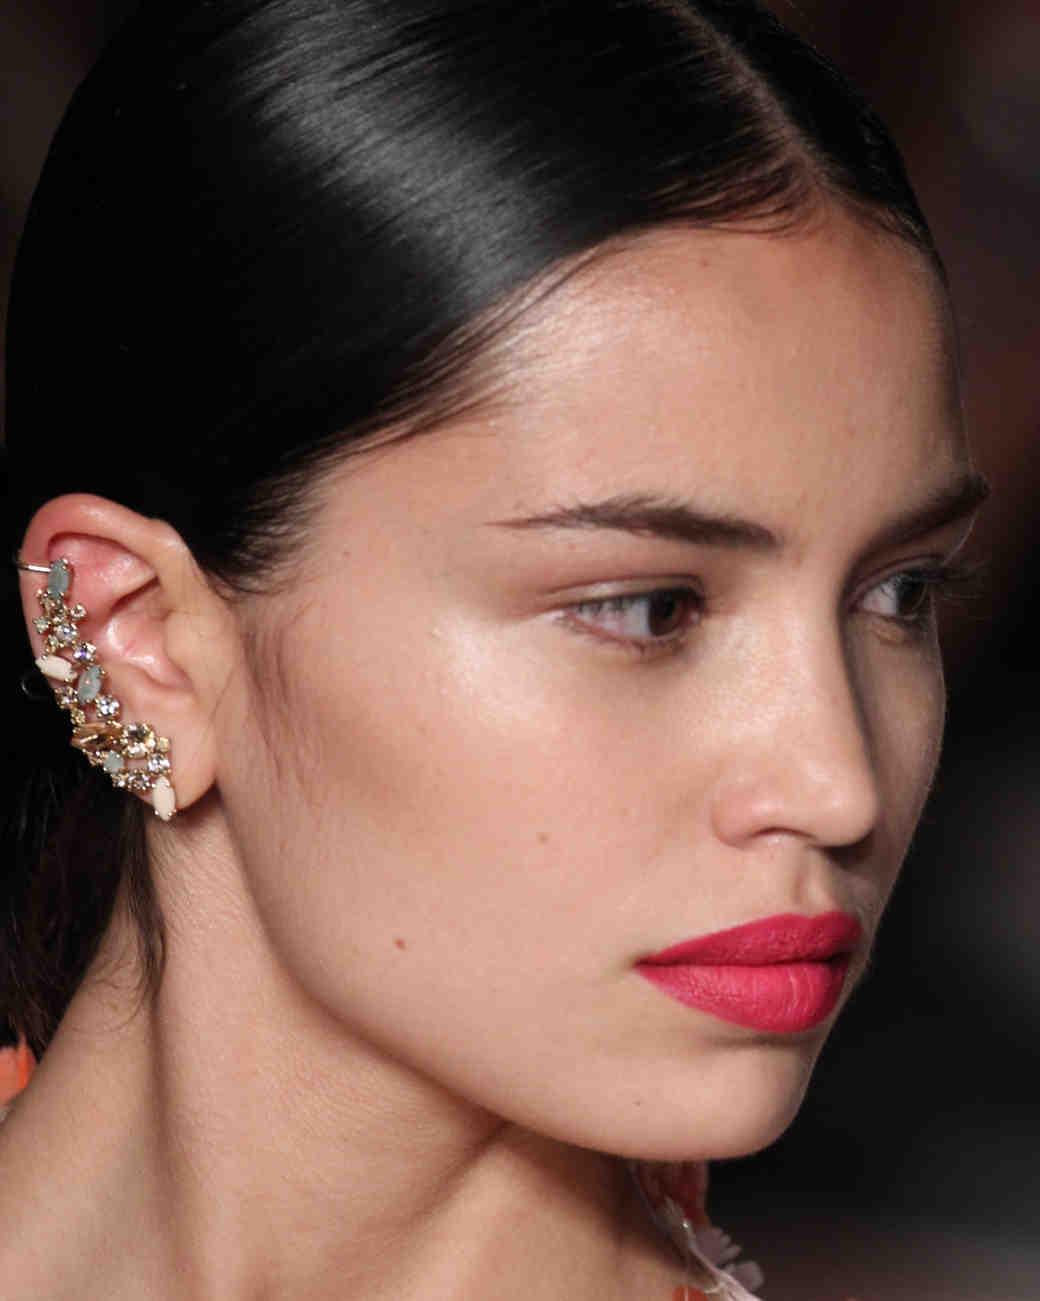 sp16-nyfw-bridal-accessories-marchesa-earrings-0915.jpg